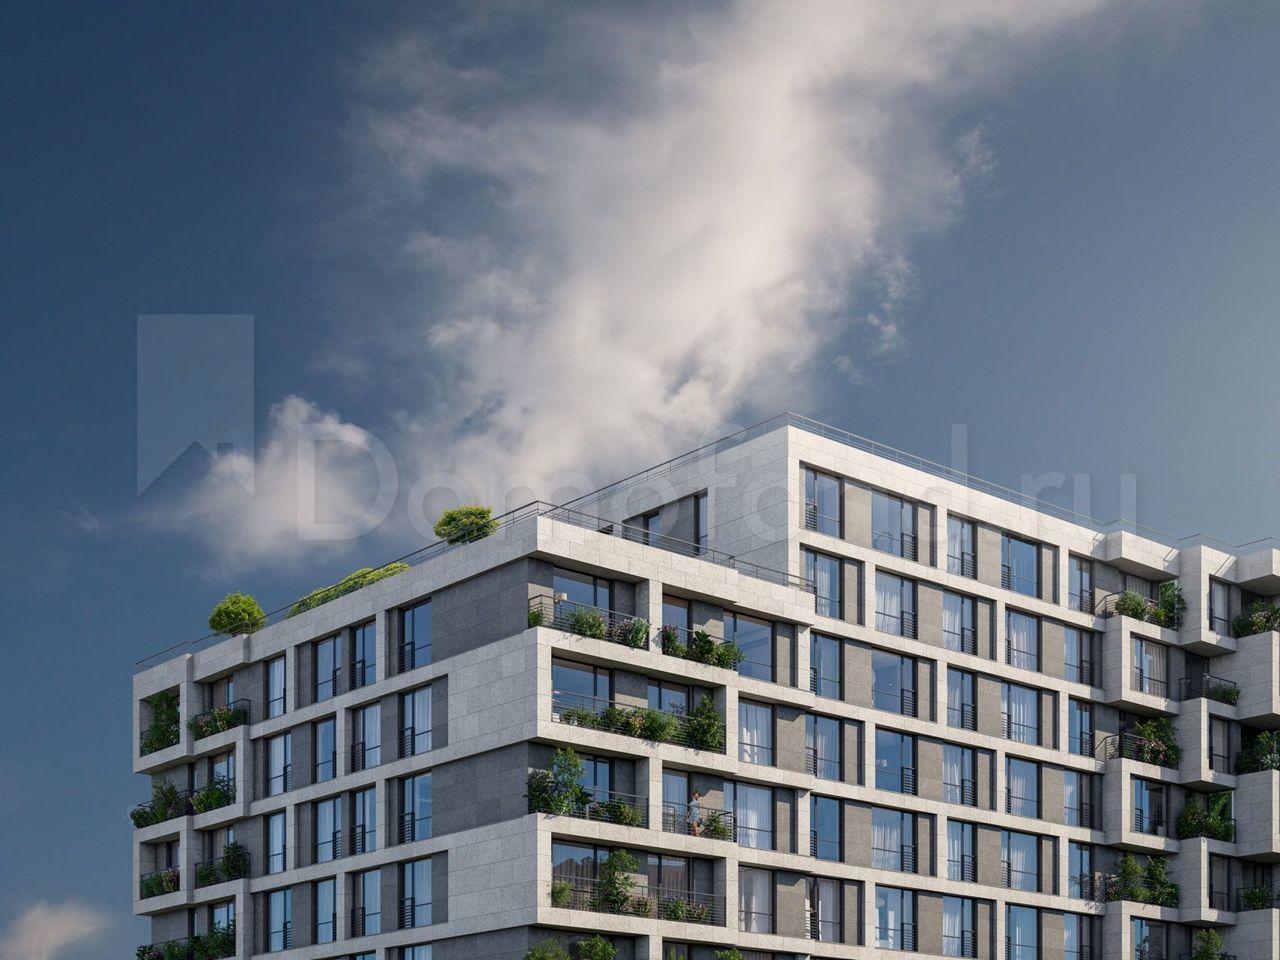 Недвижимость 2-комн. квартира, 113.3 м², 5/15 эт. Мир